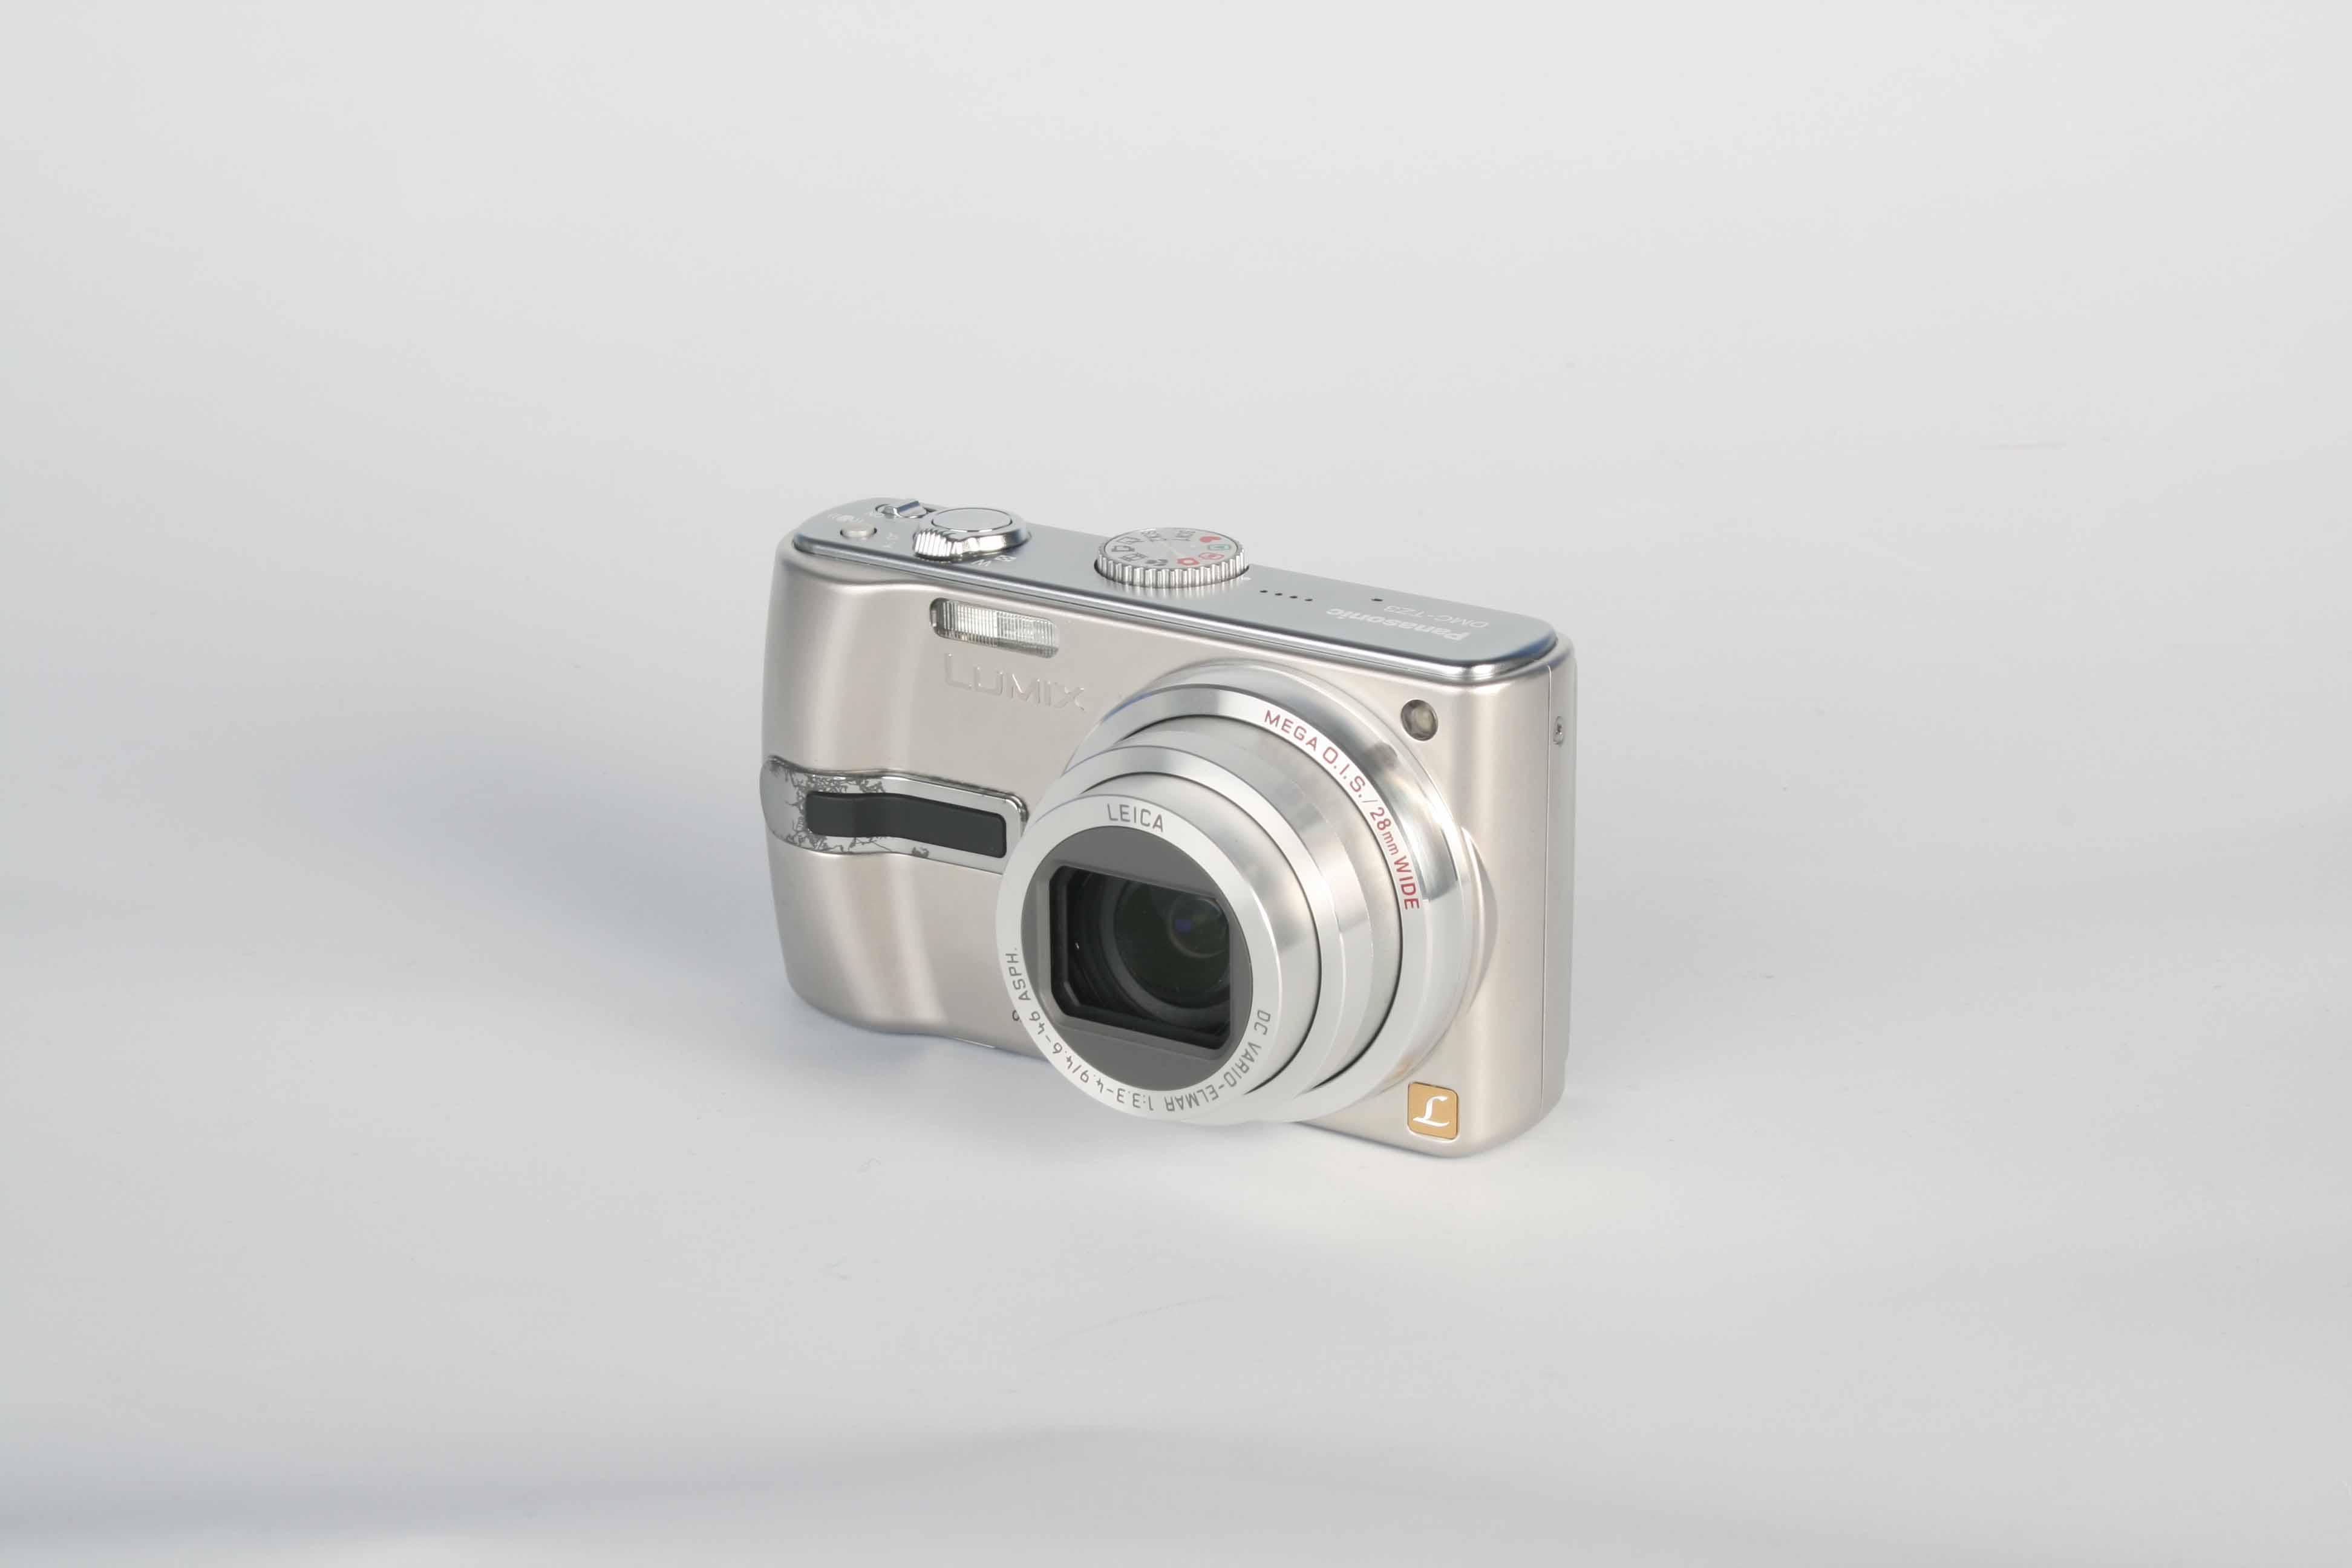 panasonic dmctz3 digital camera review